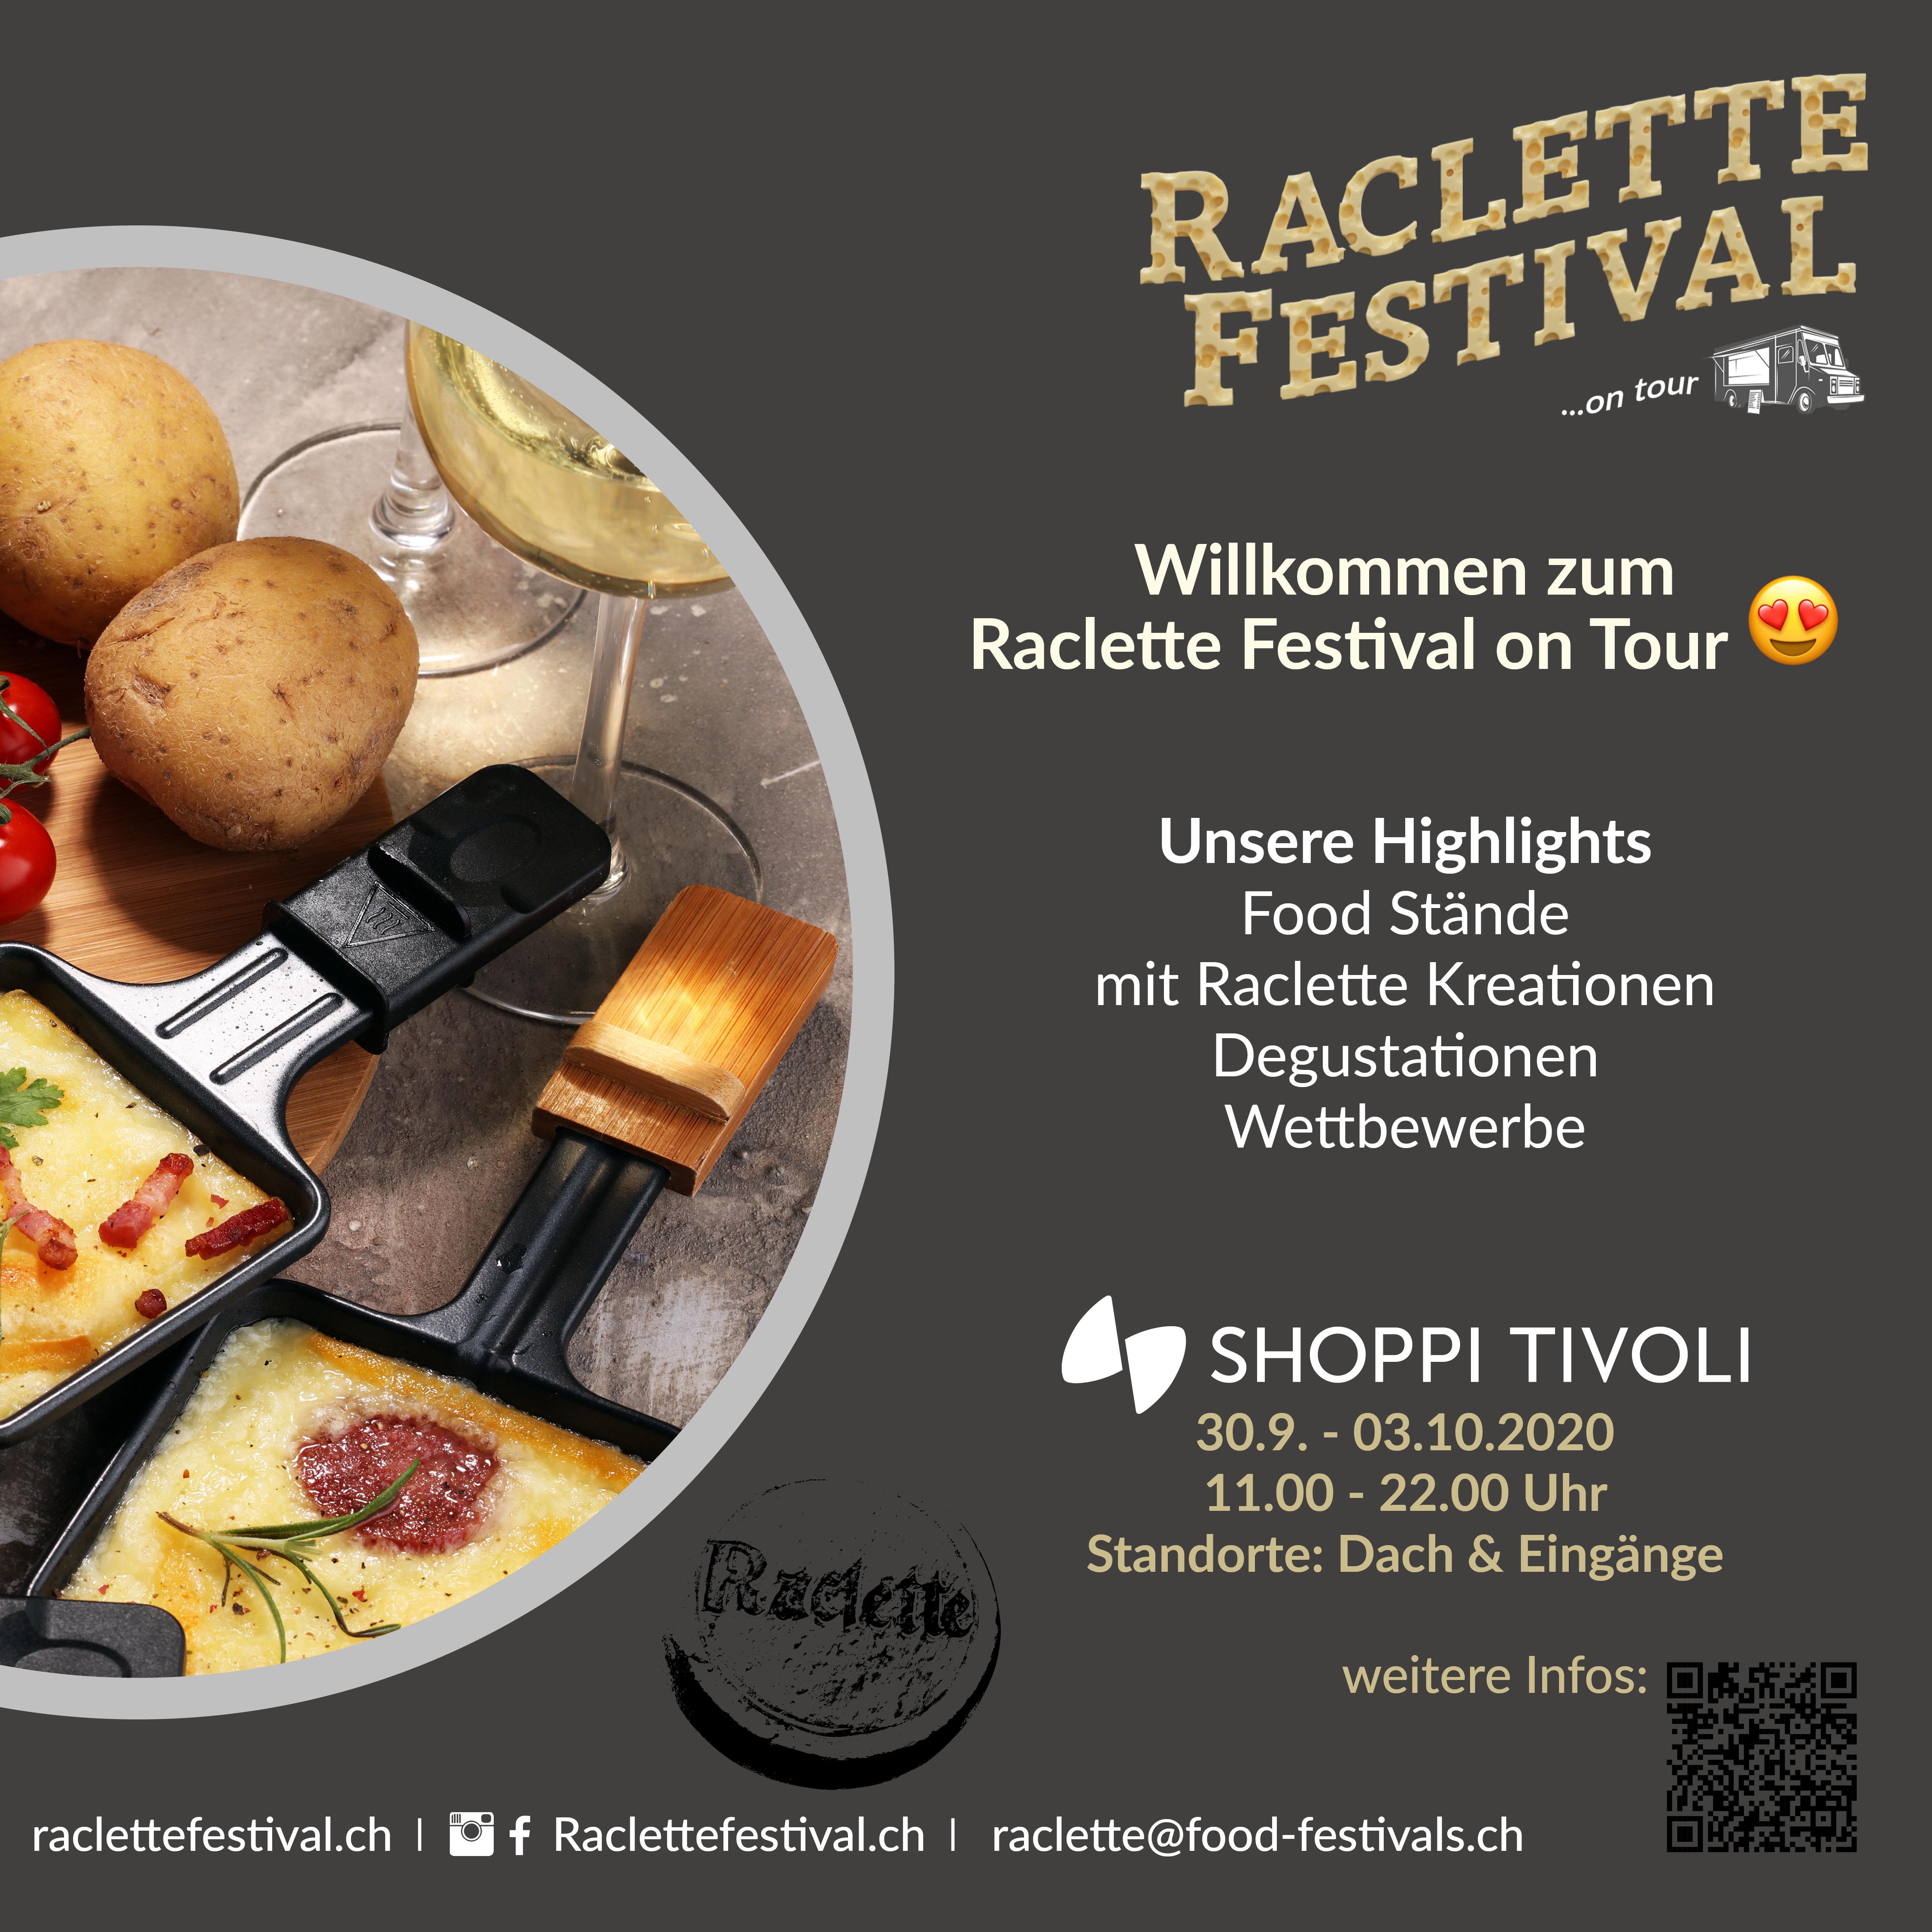 Raclette Festival on Tour